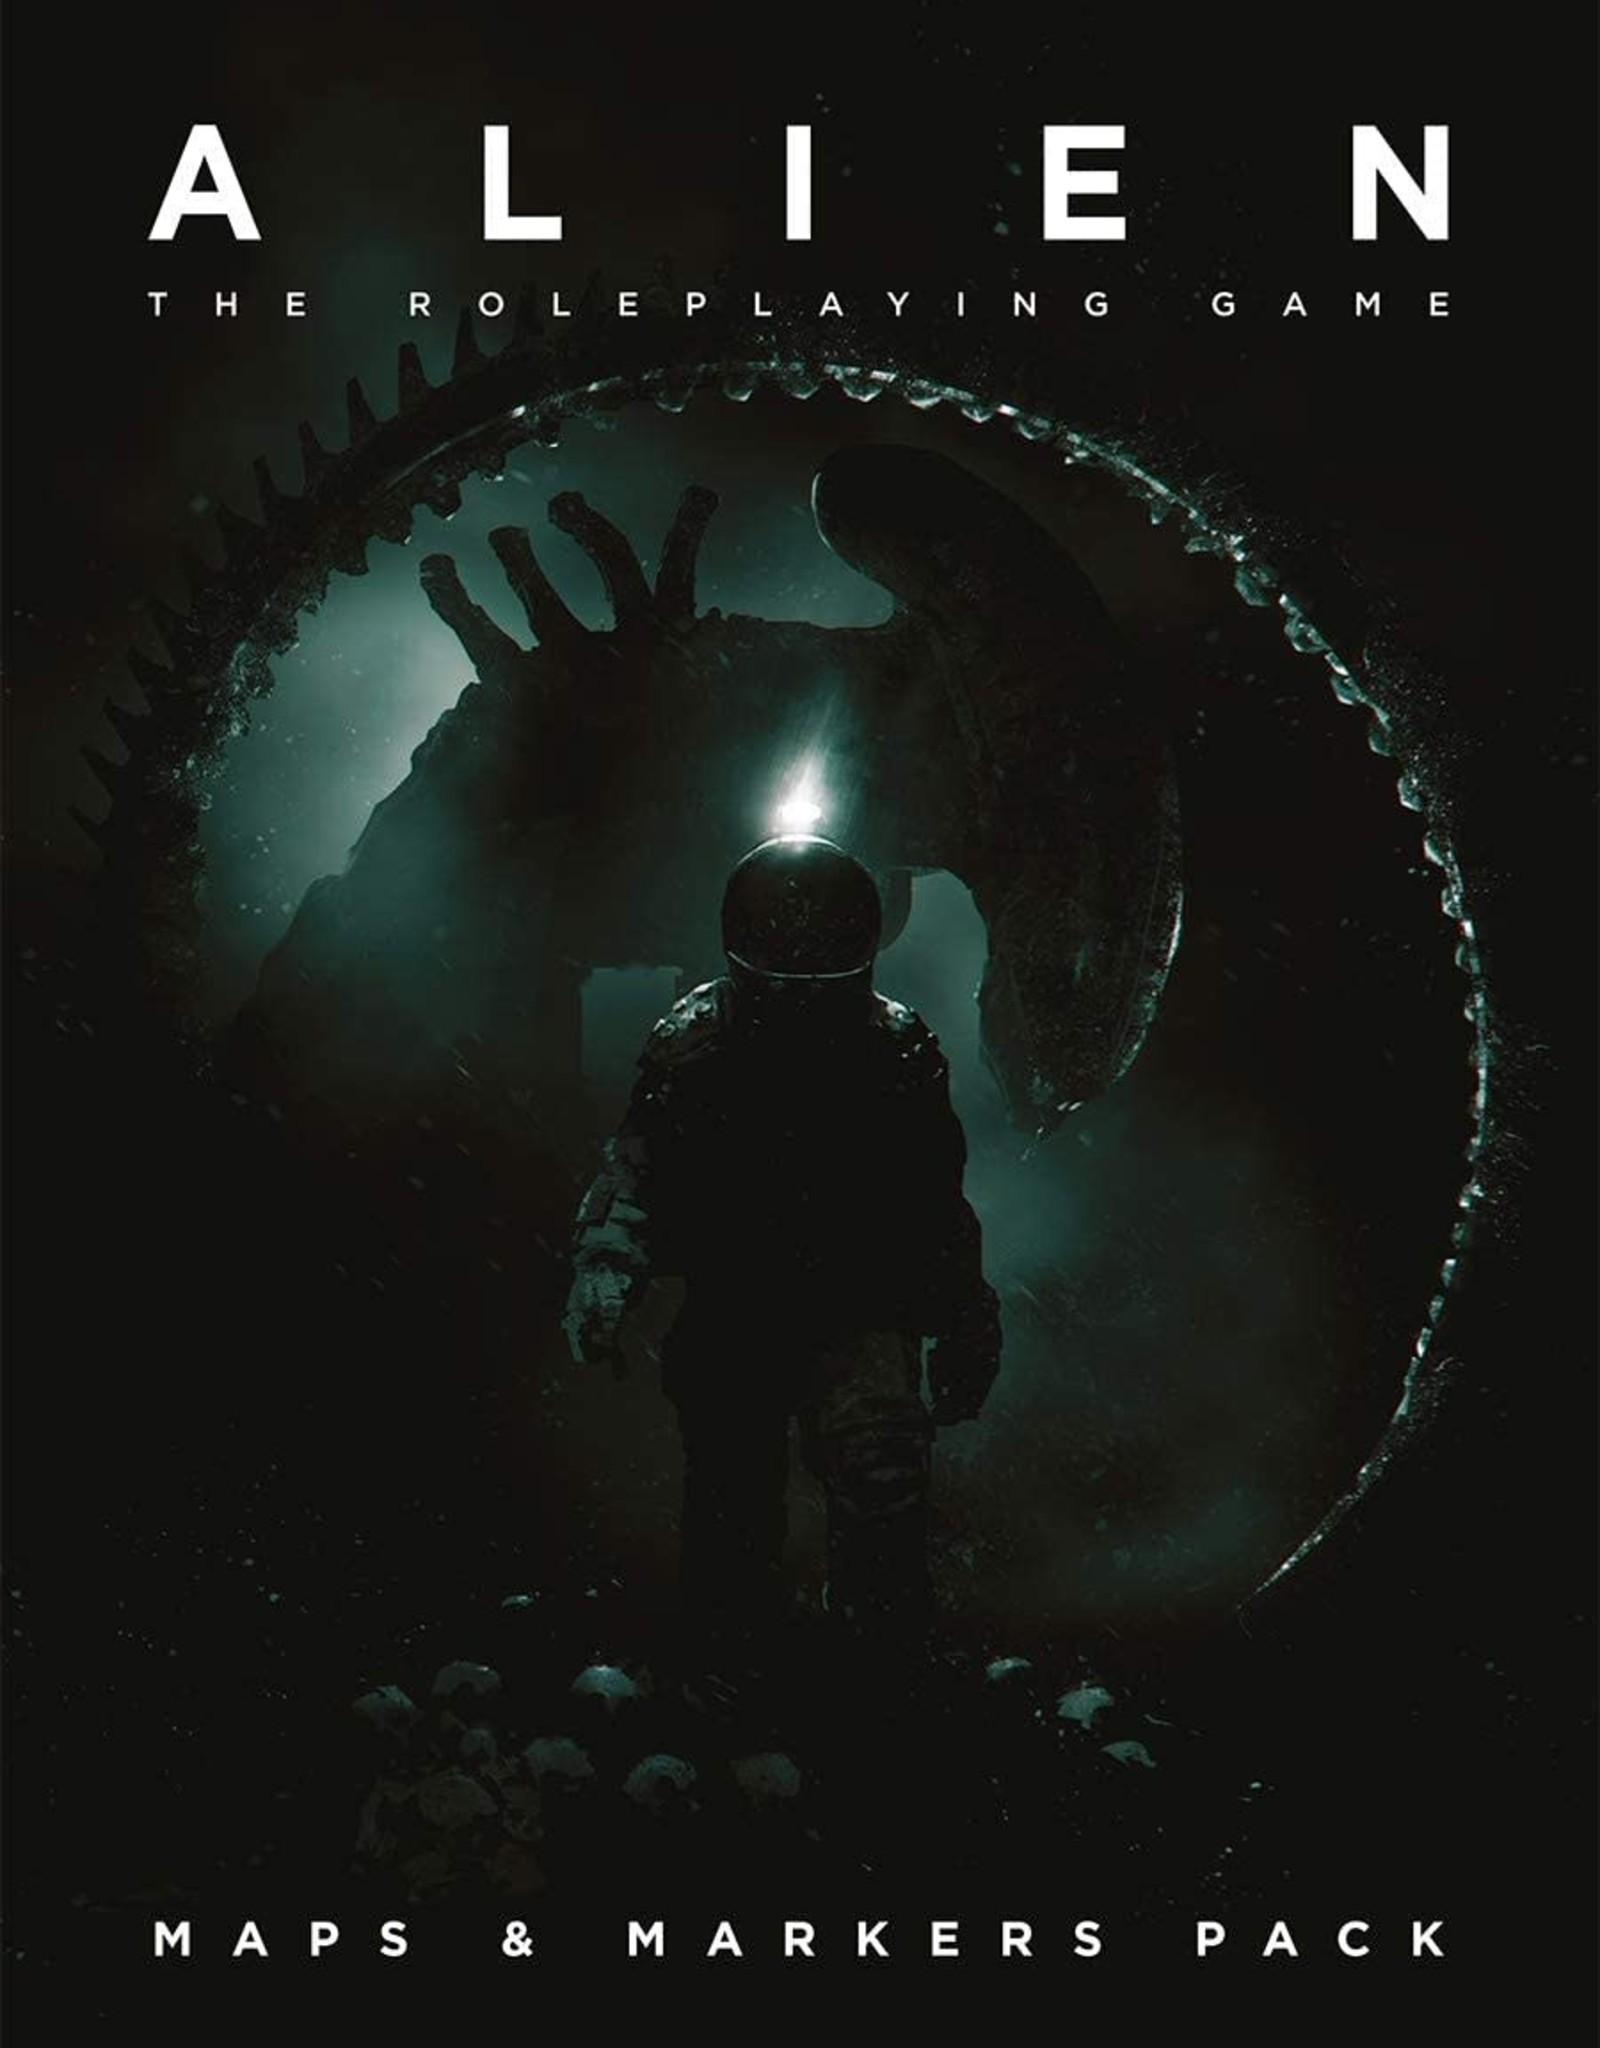 Alien RPG: Maps & Markers Pack